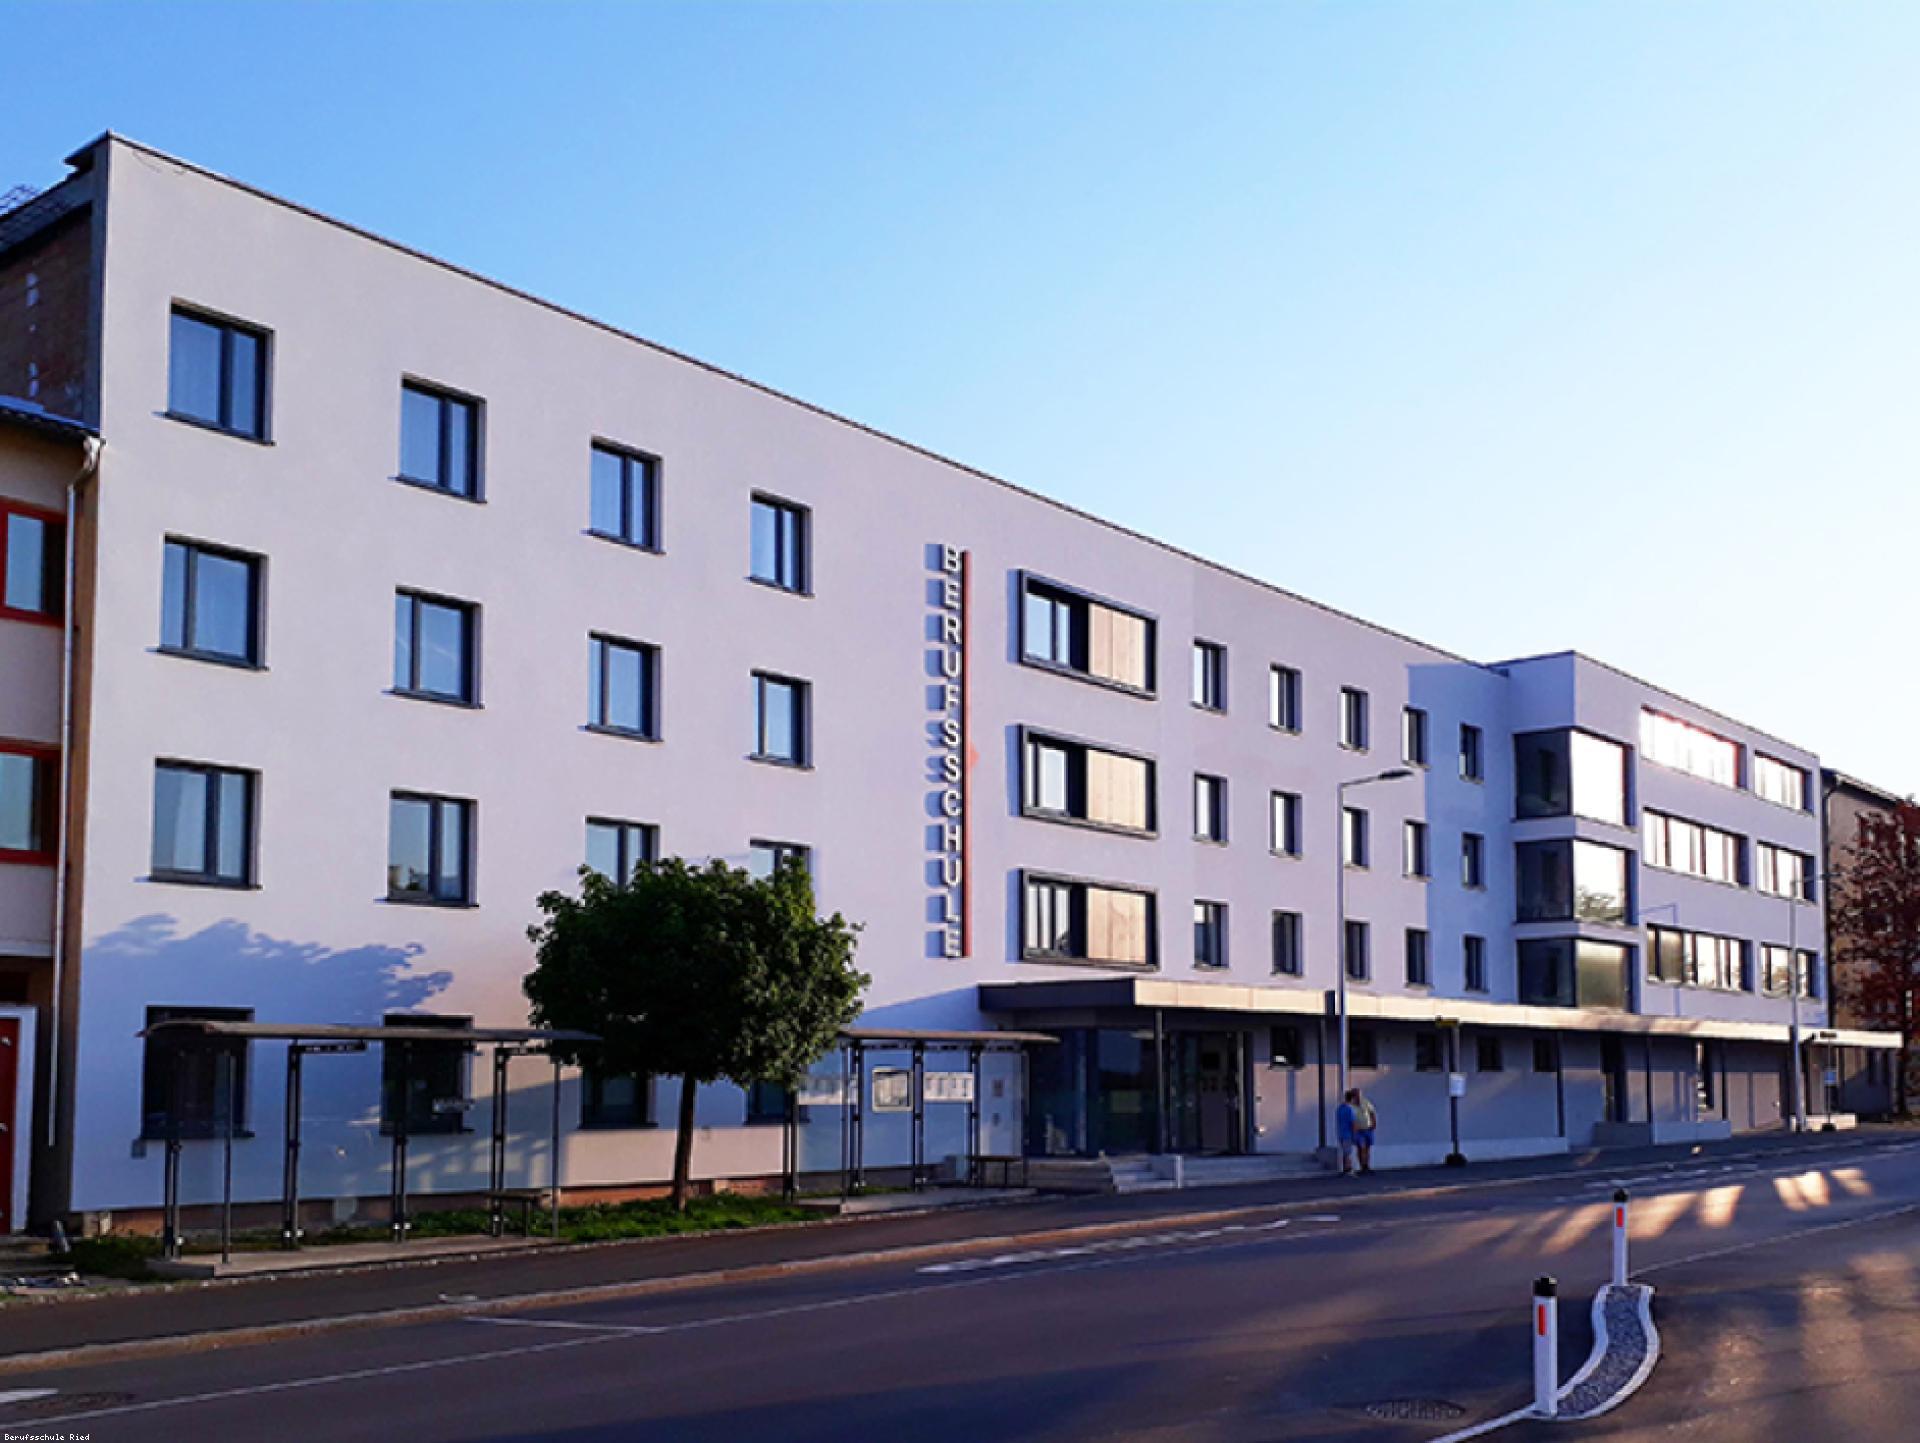 Mood-Image EBG Referenz: Berufsschule Ried im Innkreis, Internat Generalsanierung